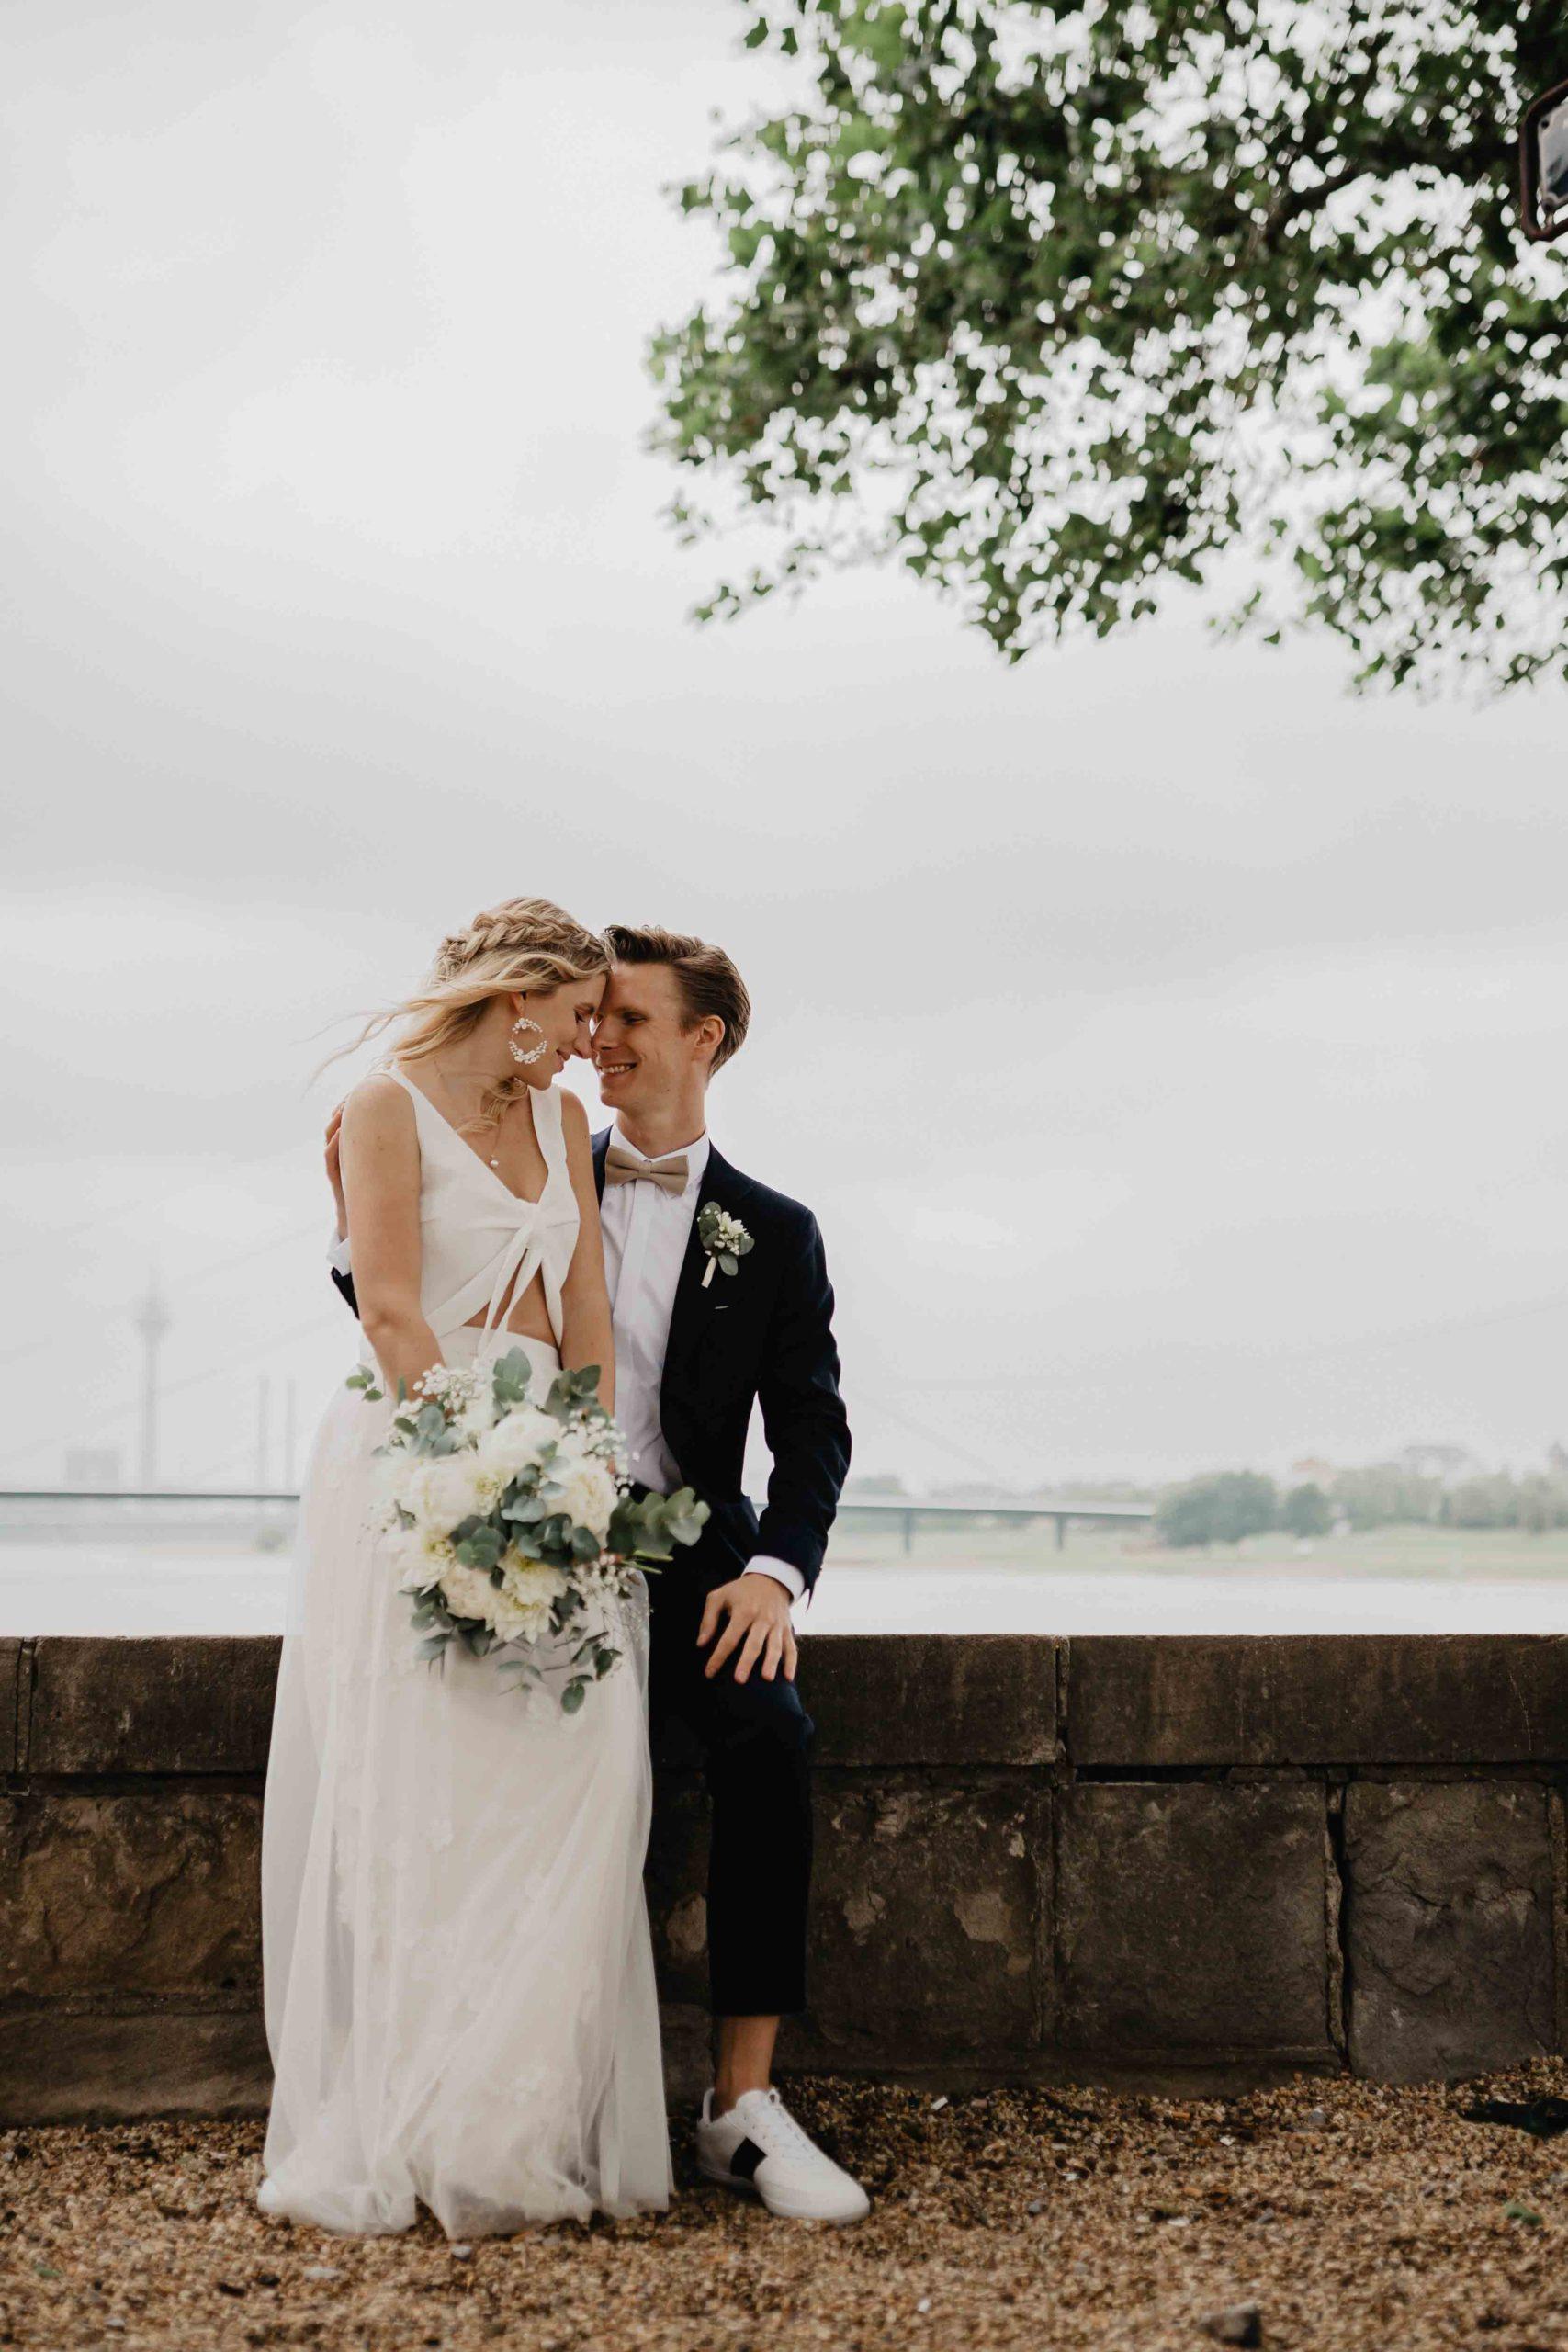 Braut auf Bräutigams Schoß